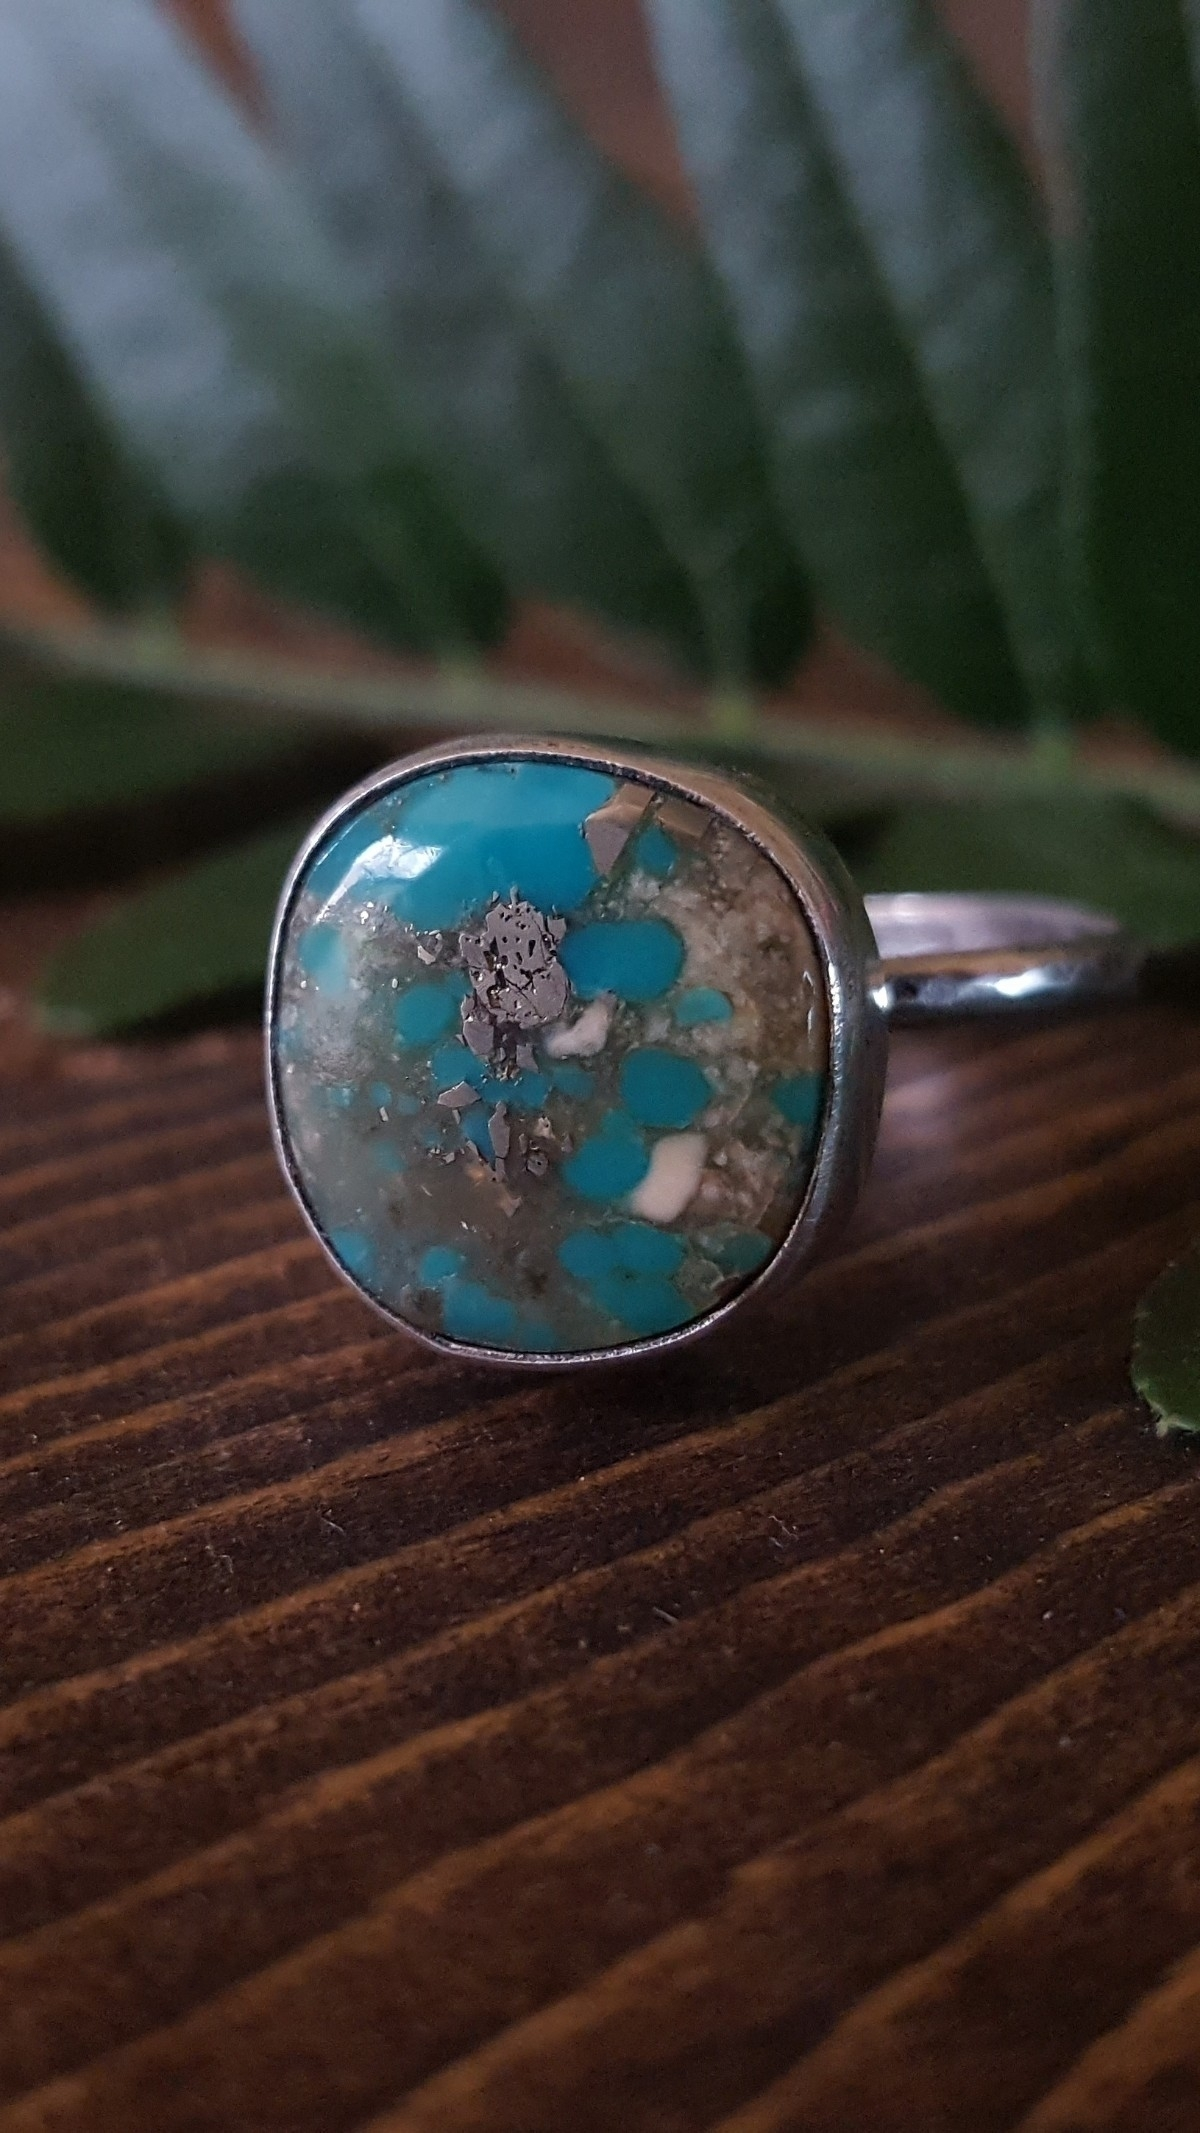 Campitos turquoise set silver   - crystalsandsucculents   ello